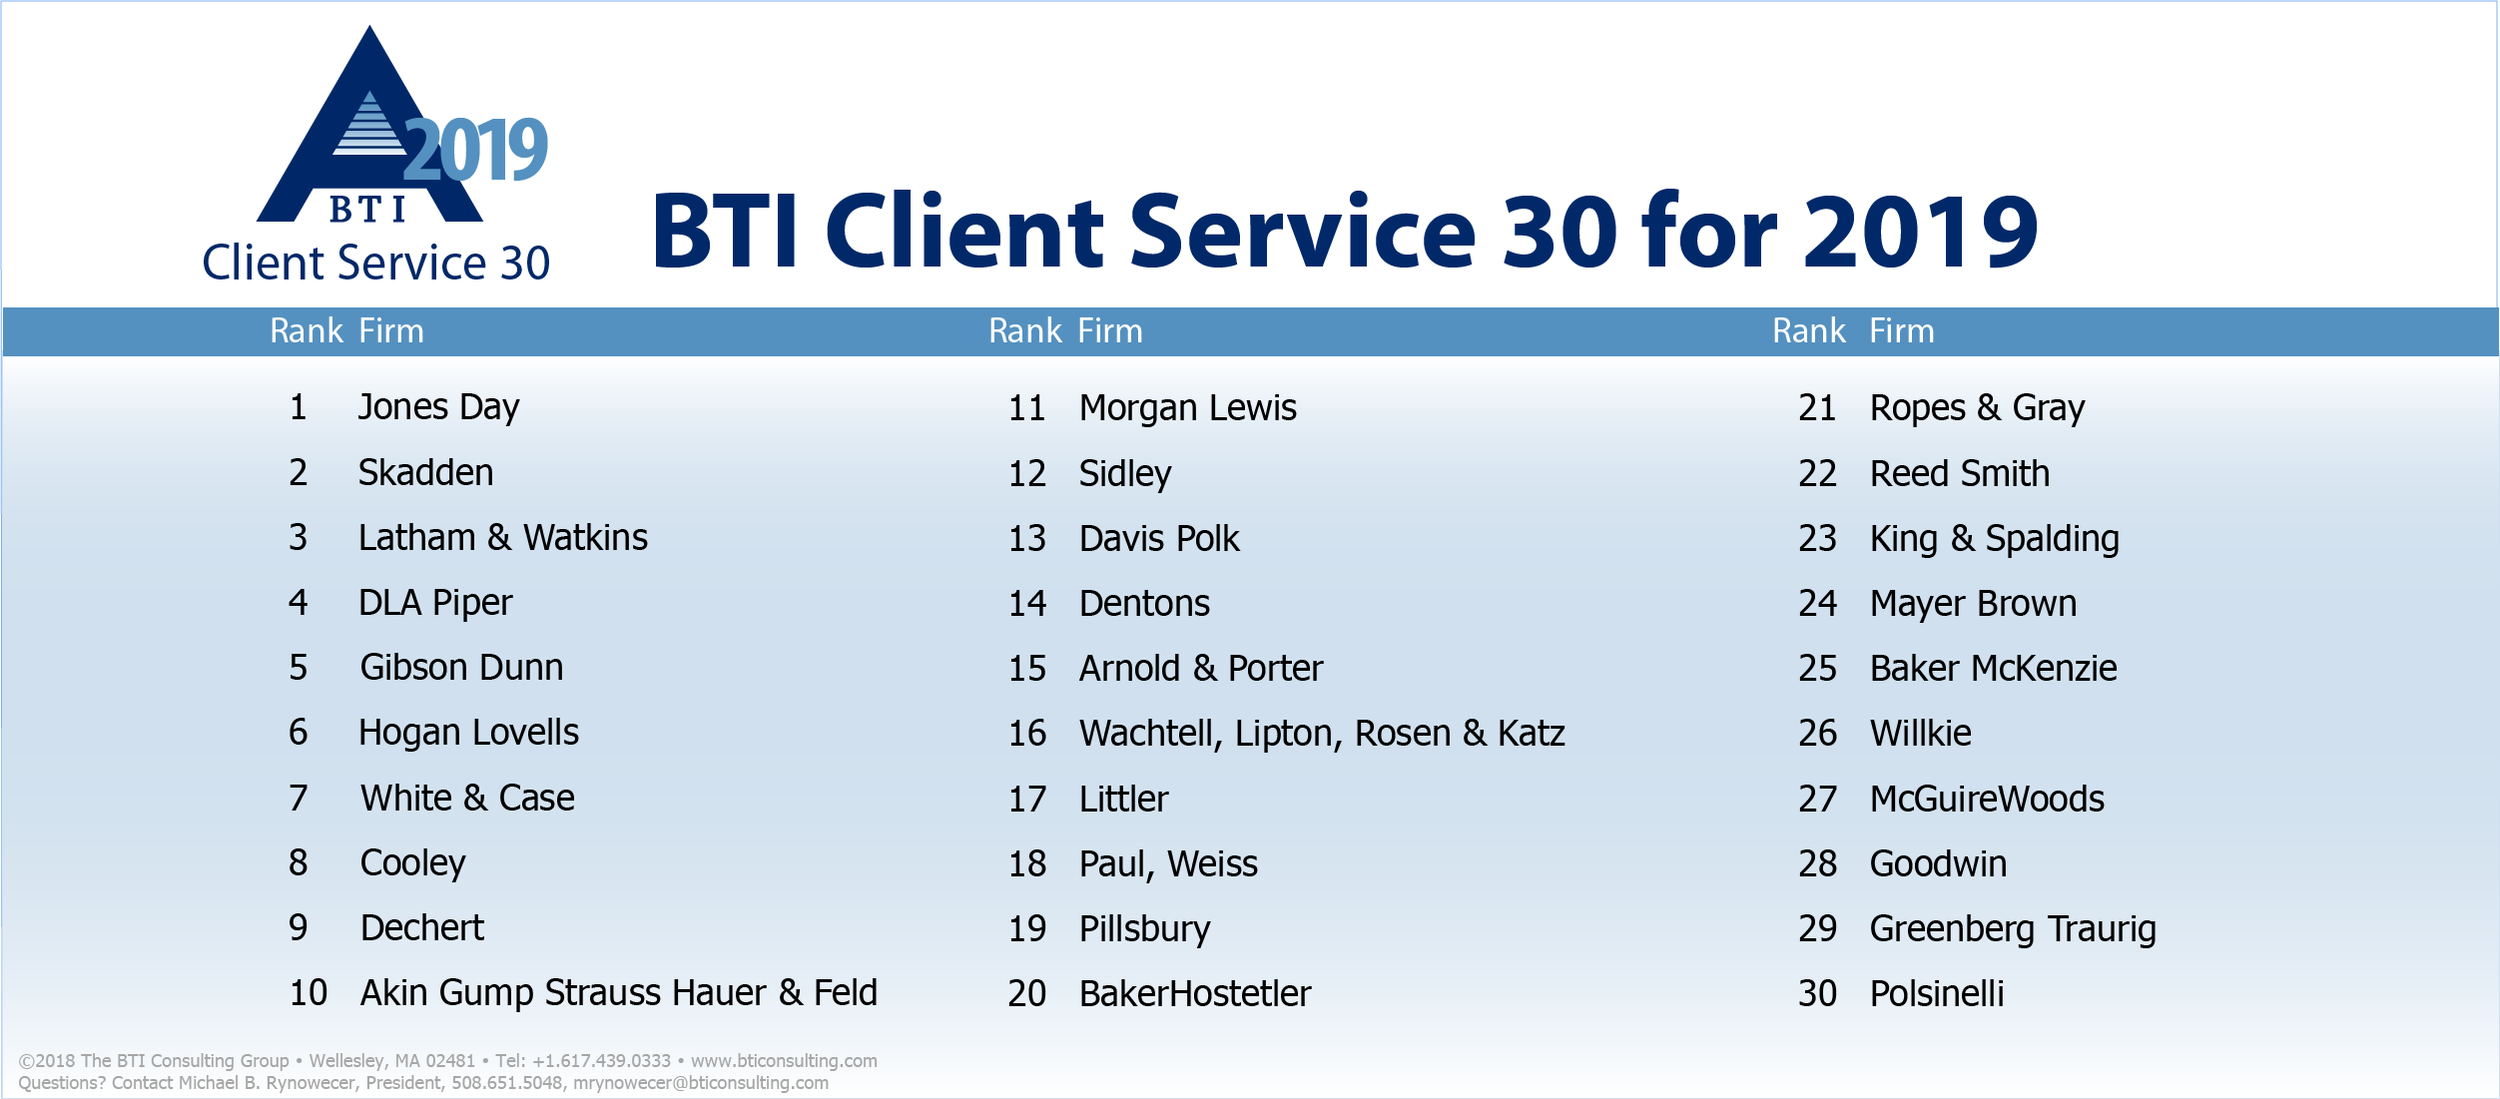 BTI_Client_Service_30_2019_header.png